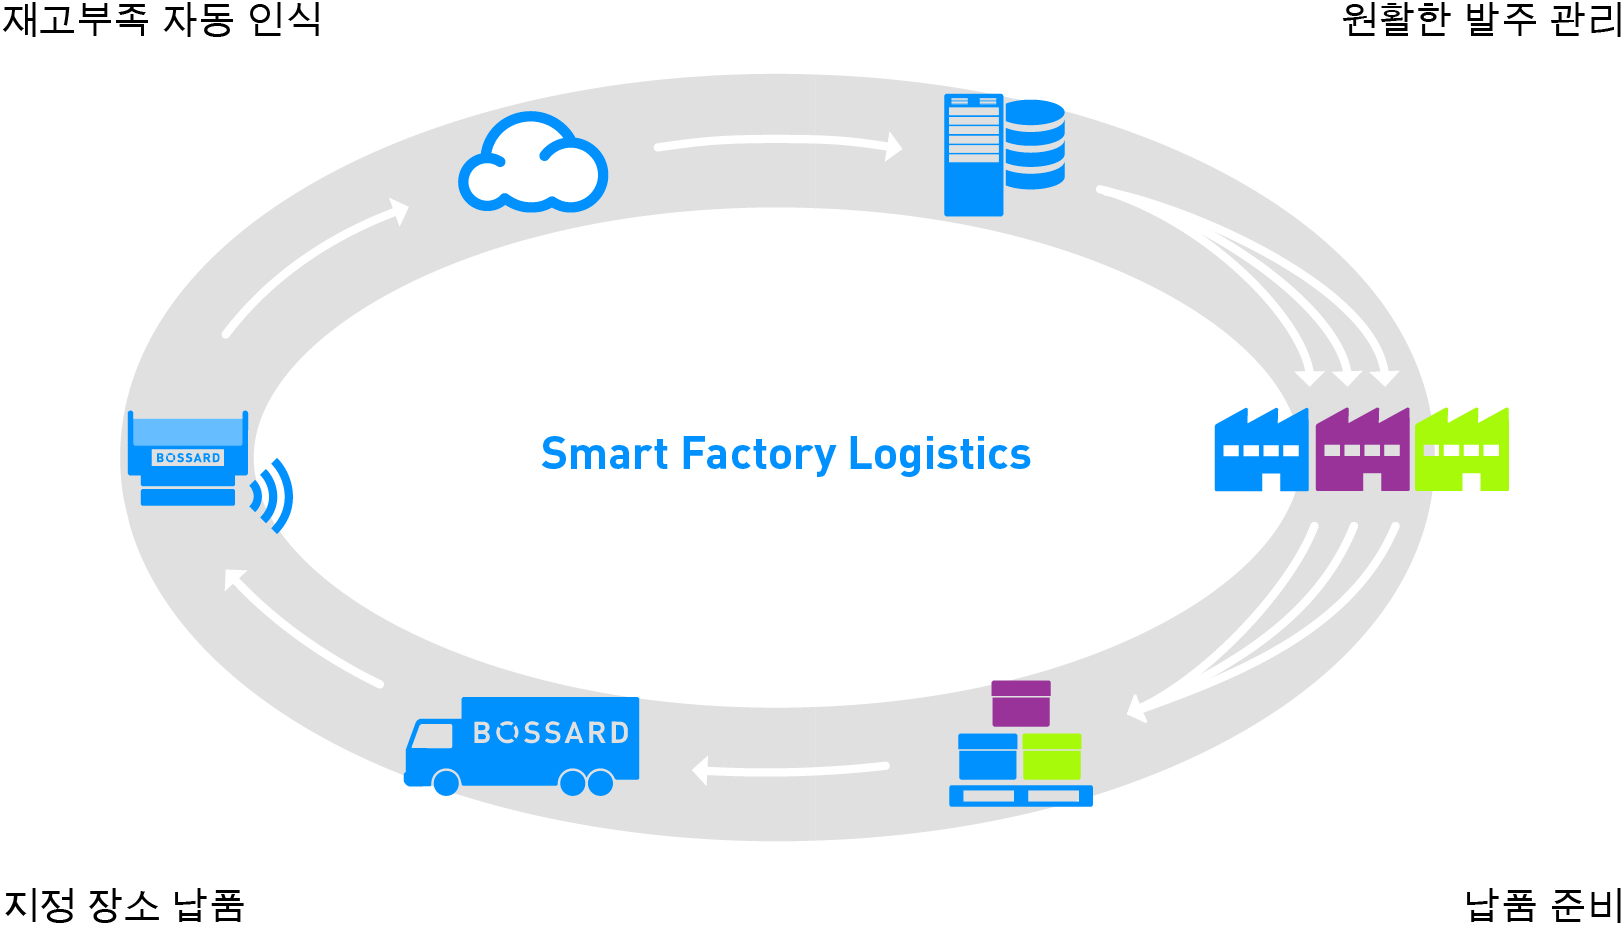 process of Smart Factory Logistics